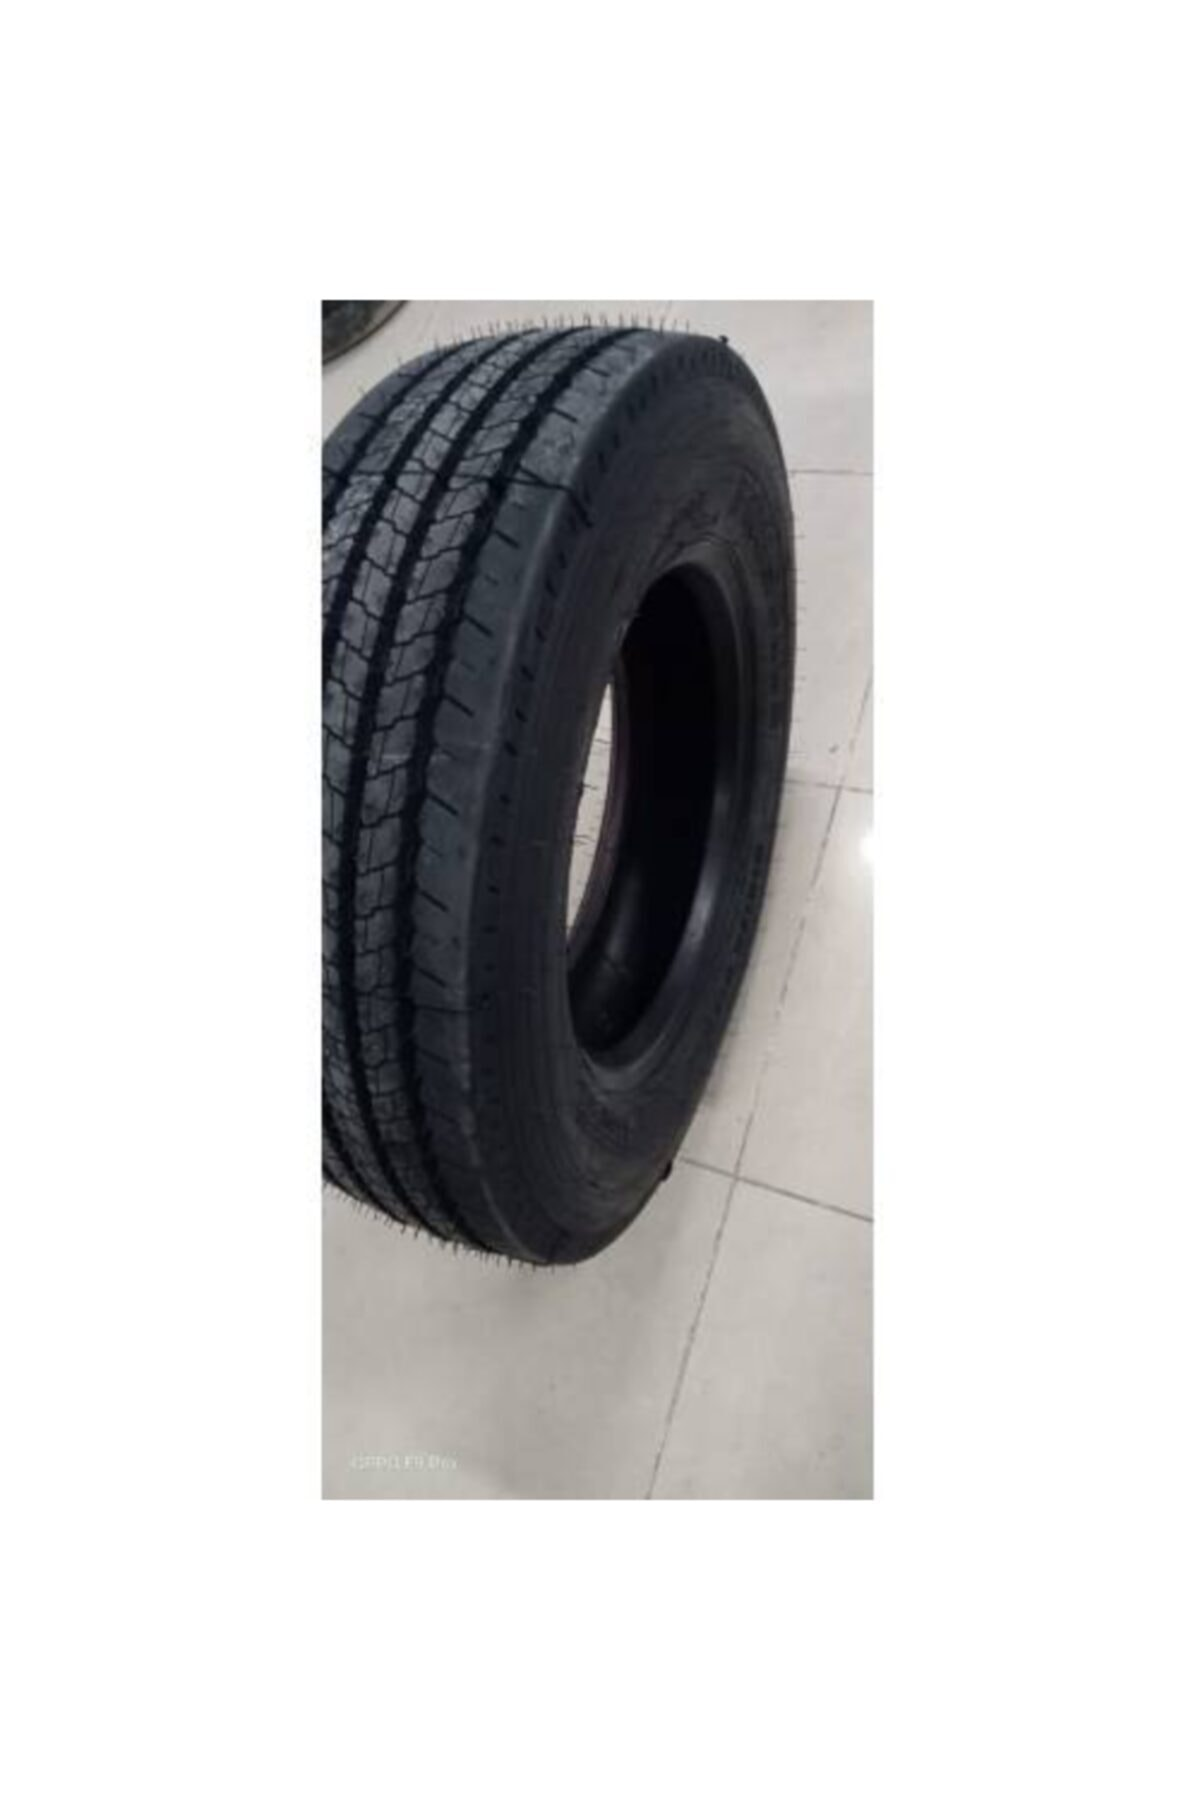 Pirelli 215/75 R17.5 Fr85 126/124m Tl Plus M+s (ön) (üretim Tarihi 2020)